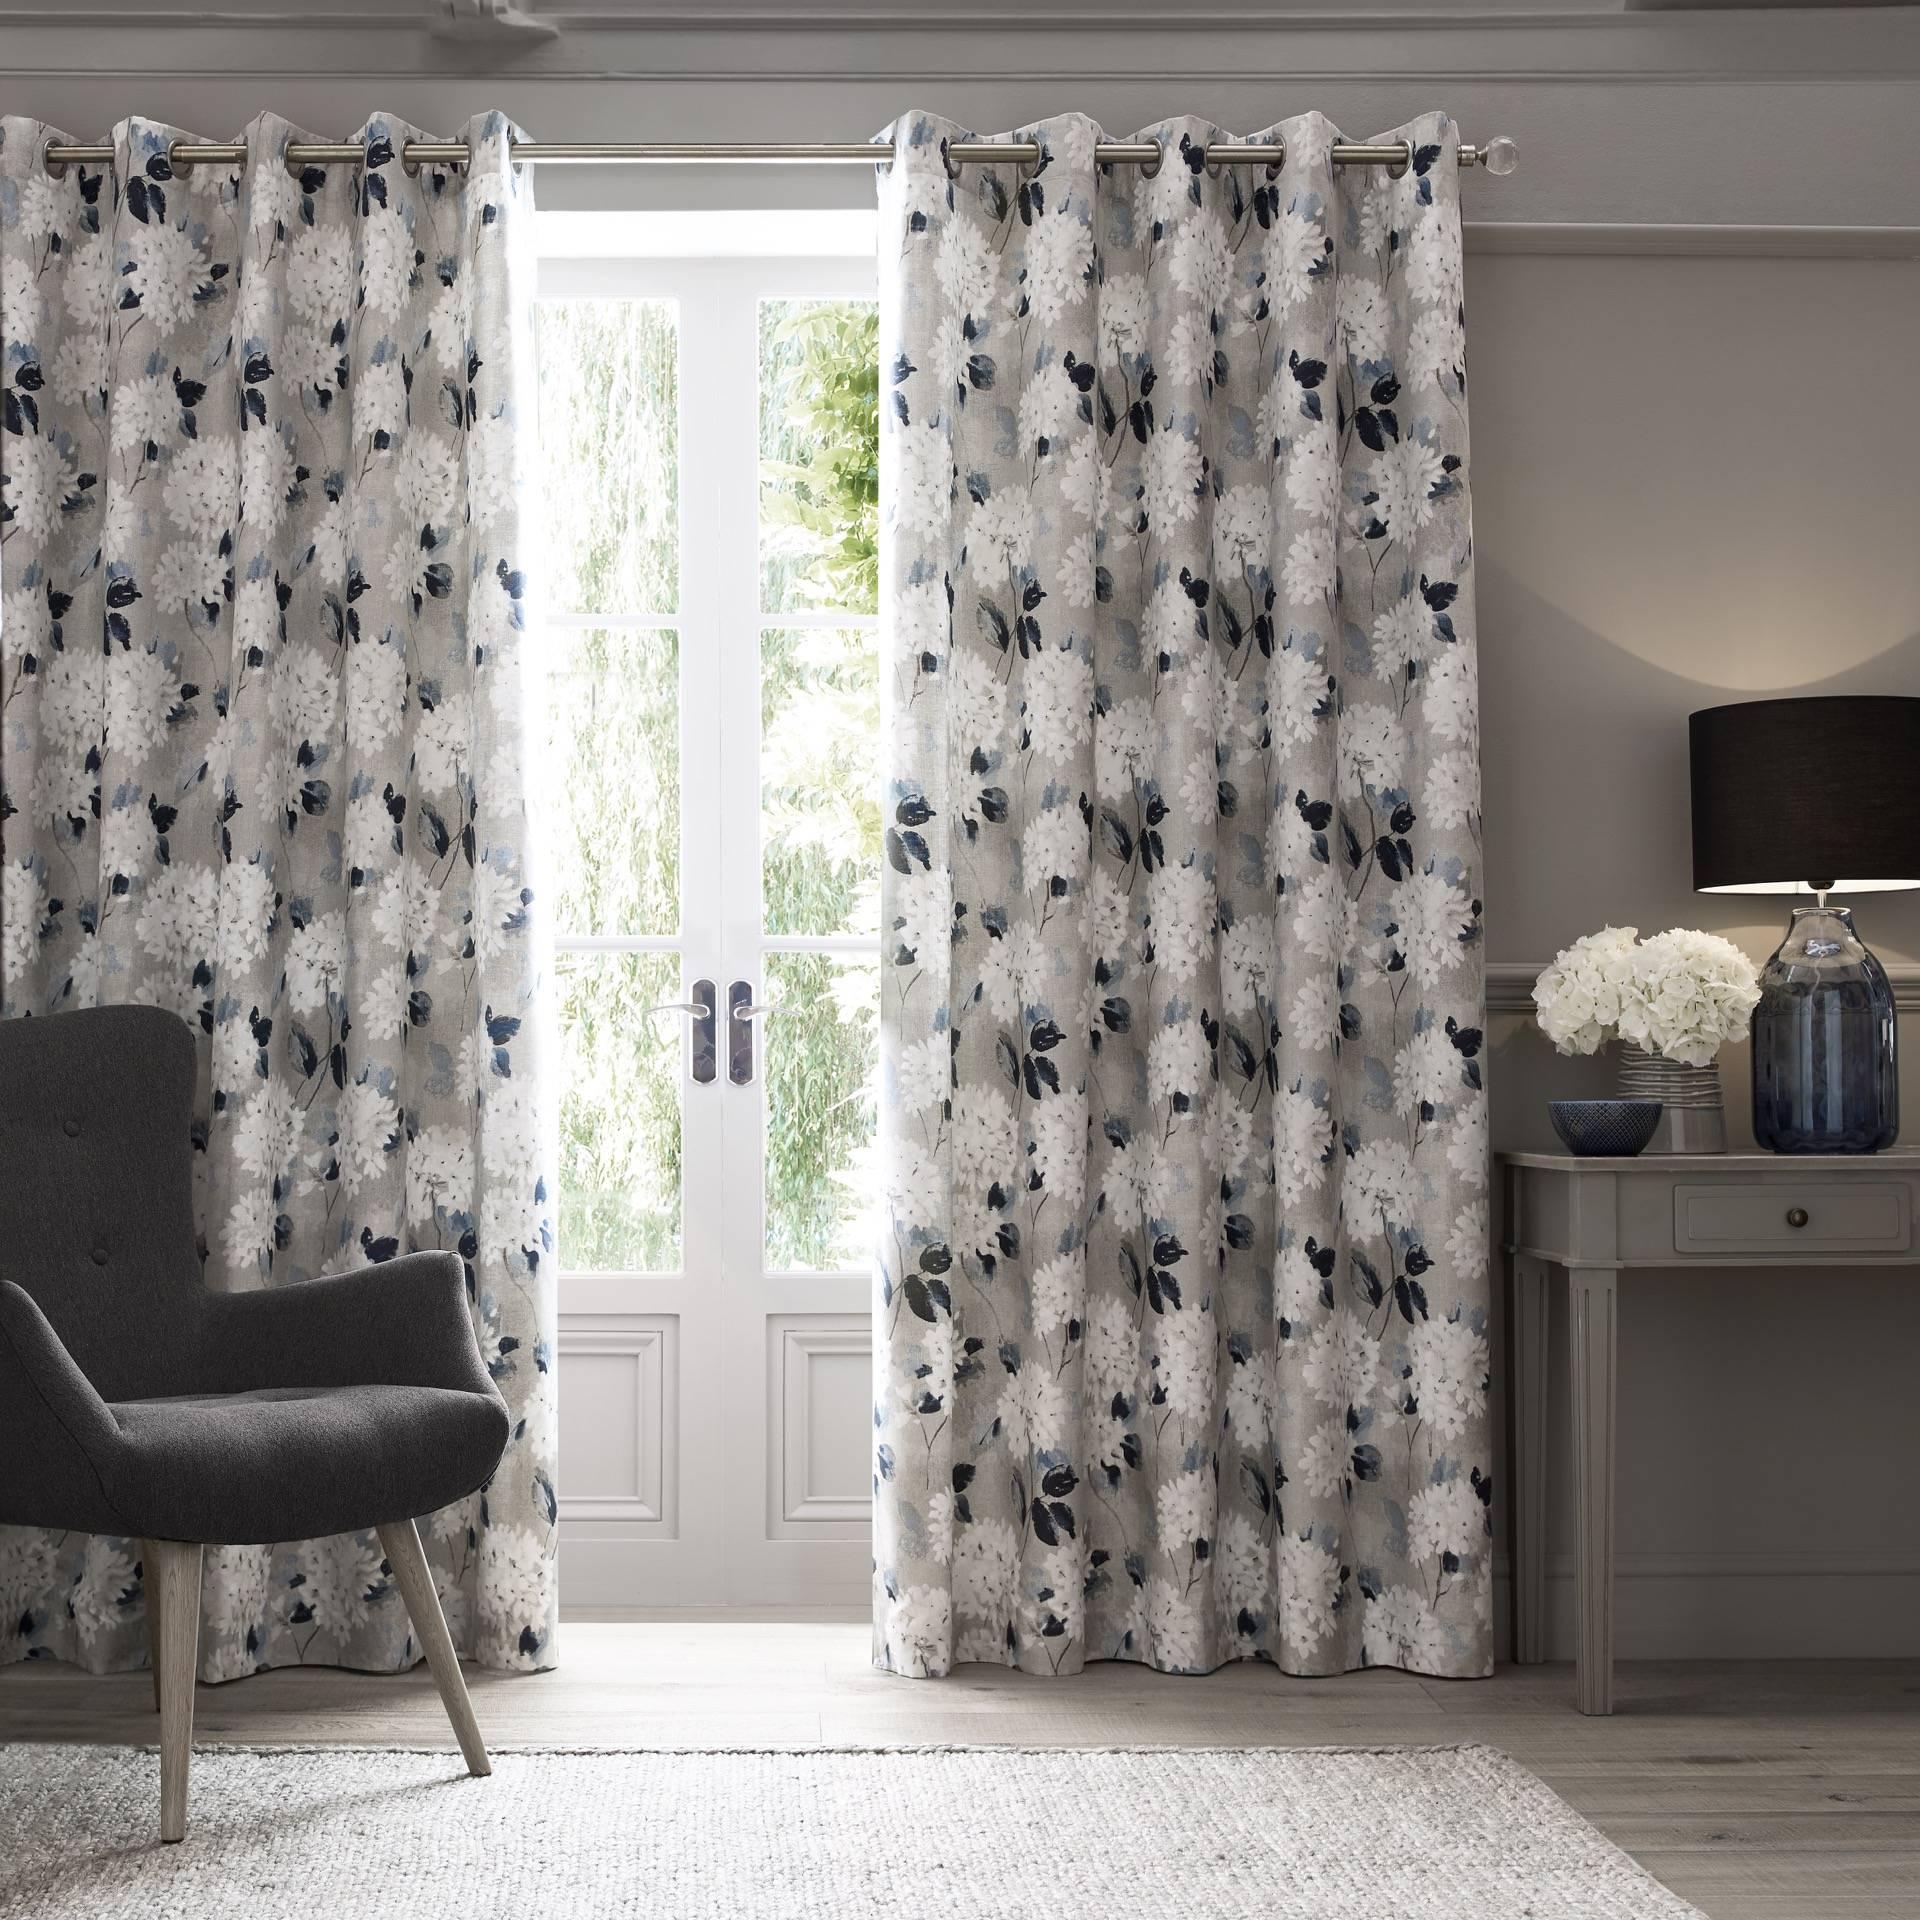 isabelle curtains ashley wilde. Black Bedroom Furniture Sets. Home Design Ideas